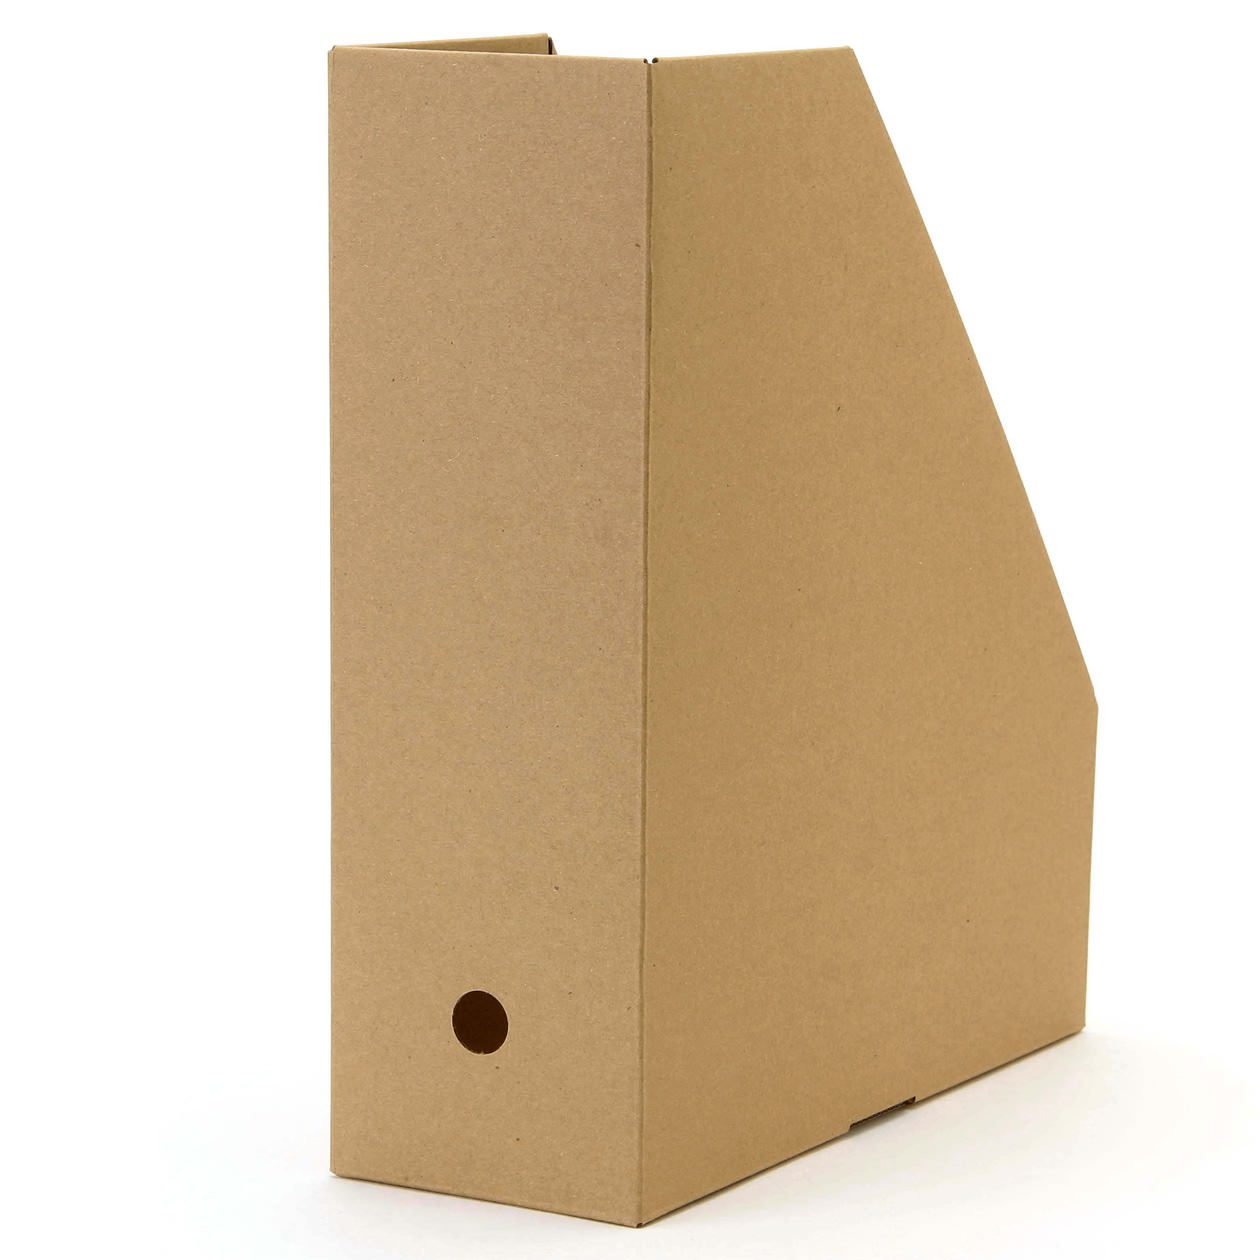 RoomClip商品情報 - ワンタッチで組み立てられるダンボールスタンドファイルボックス・5枚組